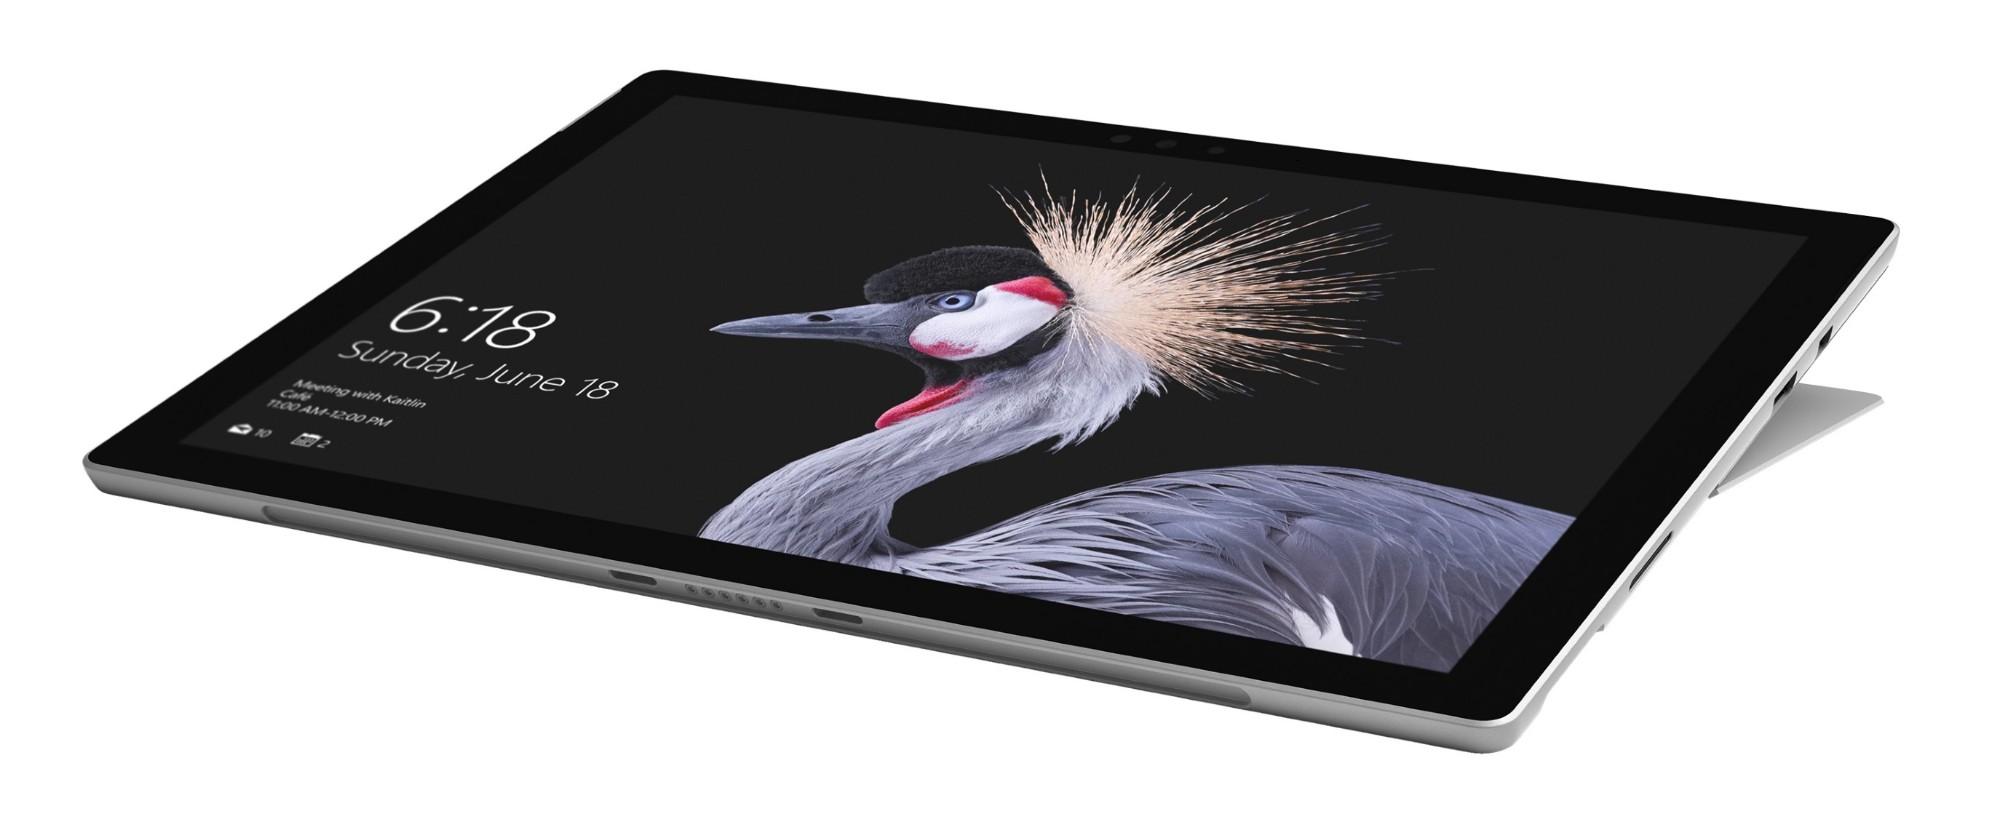 "Microsoft Surface Pro 31.2 cm (12.3"") 7th gen Intel® Core™ i5 8 GB 256 GB Wi-Fi 5 (802.11ac) Black,Silver Windows 10 Pro"